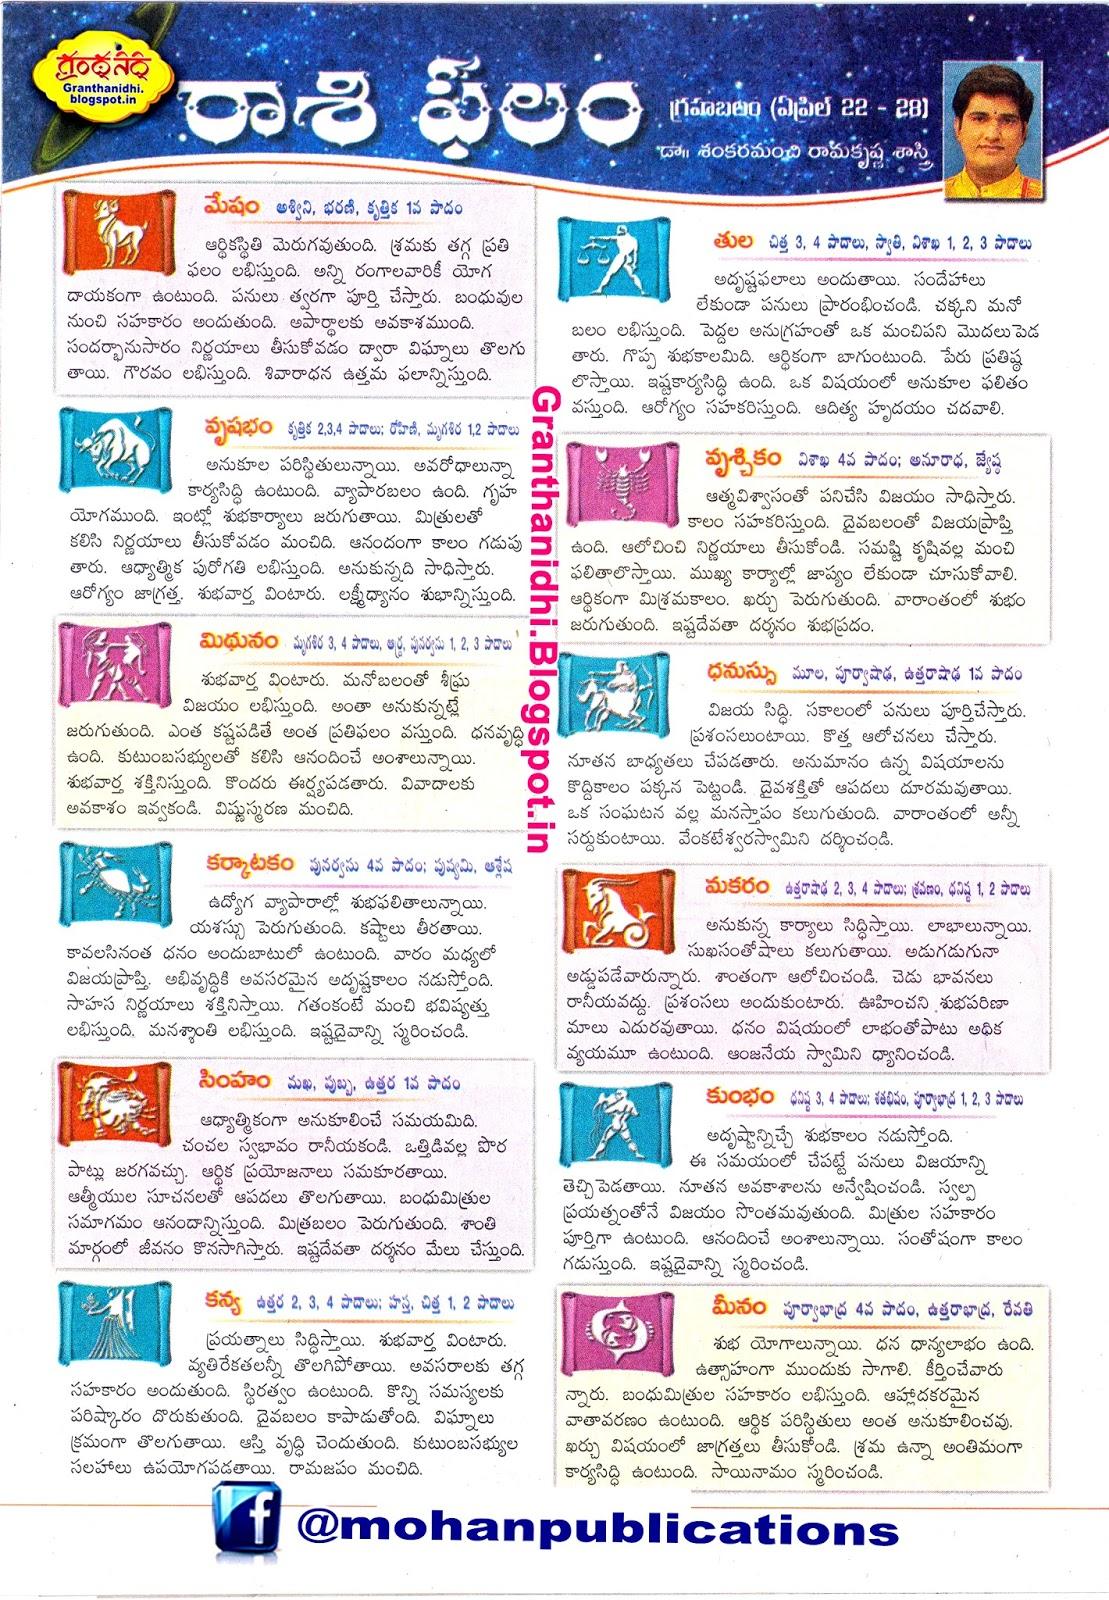 sankaramanchi ramakrishna sastry rasi phalalu weekly sankaramanchi ramakrishna Grahabalam bhakthi pustakalu bhakti pustakalu bhakthipustakalu bhaktipustakalu RasiPhalalu Sunday-Magazine Eenadu.net EenaduEpaper EenaduSunday మేషం (అశ్విని, భరణి, కృత్తిక 1వ పాదం) వృషభం (కృత్తిక 2,3,4 పాదాలు; రోహిణి, మృగశిర 1,2 పాదాలు) మిథునం  (మృగశిర 3, 4 పాదాలు, ఆర్ద్ర, పునర్వసు 1, 2, 3 పాదాలు) కర్కాటకం (పునర్వసు 4వ పాదం; పుష్యమి, ఆశ్లేష) సింహం (మఖ, పుబ్బ, ఉత్తర 1వ పాదం) కన్య   (ఉత్తర 2, 3, 4 పాదాలు; హస్త, చిత్త 1, 2 పాదాలు) తుల (చిత్త 3, 4 పాదాలు, స్వాతి, విశాఖ 1, 2, 3 పాదాలు) వృశ్చికం (విశాఖ 4వ పాదం; అనూరాధ, జ్యేష్ఠ) ధనుస్సు (మూల, పూర్వాషాఢ, ఉత్తరాషాఢ 1వ పాదం) మకరం  (ఉత్తరాషాఢ 2, 3, 4 పాదాలు; శ్రవణం, ధనిష్ట 1, 2 పాదాలు) కుంభం (ధనిష్ట 3, 4 పాదాలు; శతభిషం, పూర్వాభాద్ర 1, 2, 3 పాదాలు) మీనం (పూర్వాభాద్ర 4వ పాదం, ఉత్తరాభాద్ర, రేవతి)